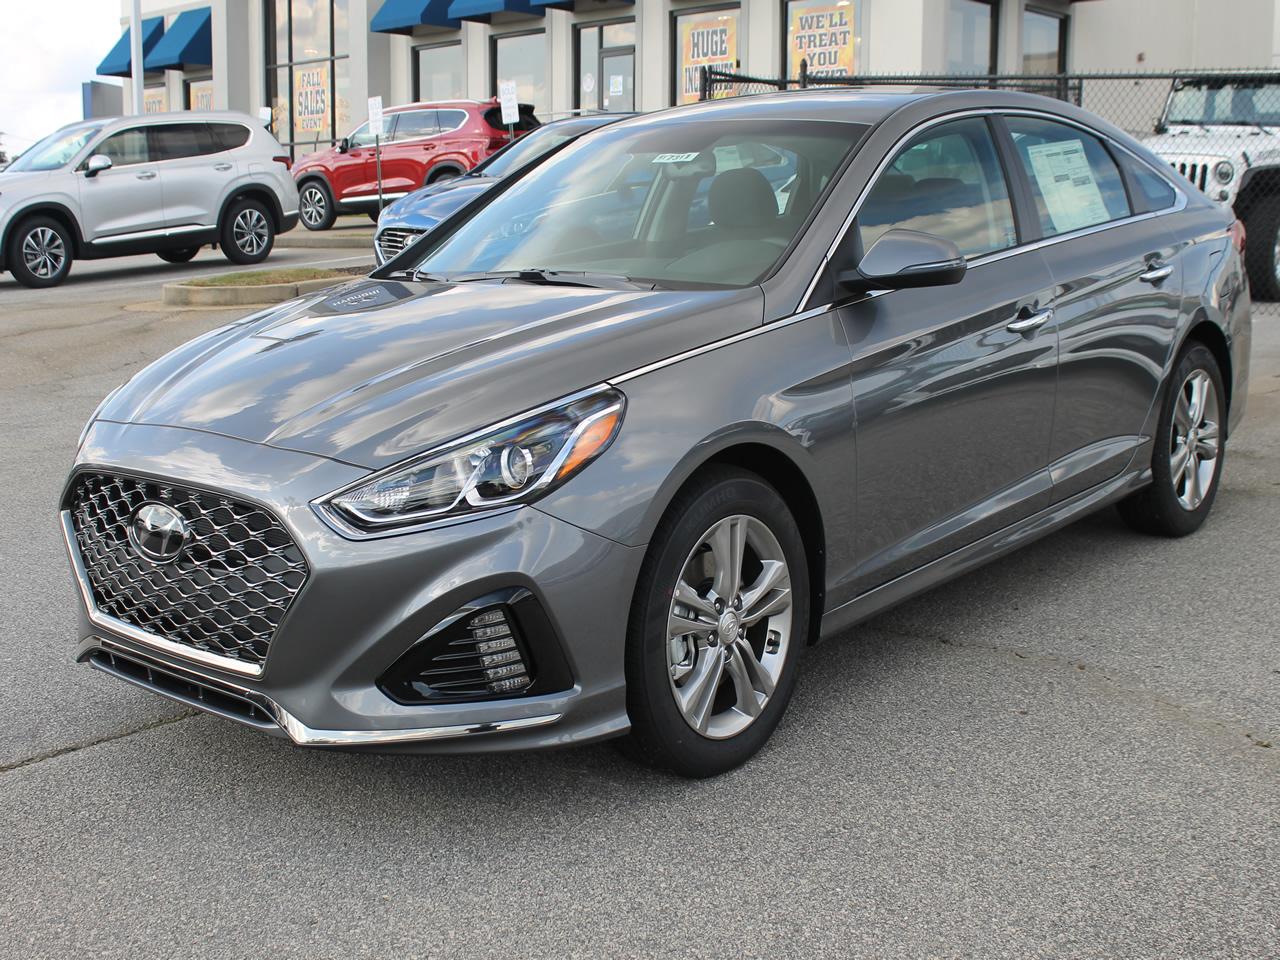 Dick Smith Hyundai >> NEW 2019 HYUNDAI SONATA SEL VIN 5NPE34AF6KH737667 - Hyundai in Greenville | Hyundai Anderson ...